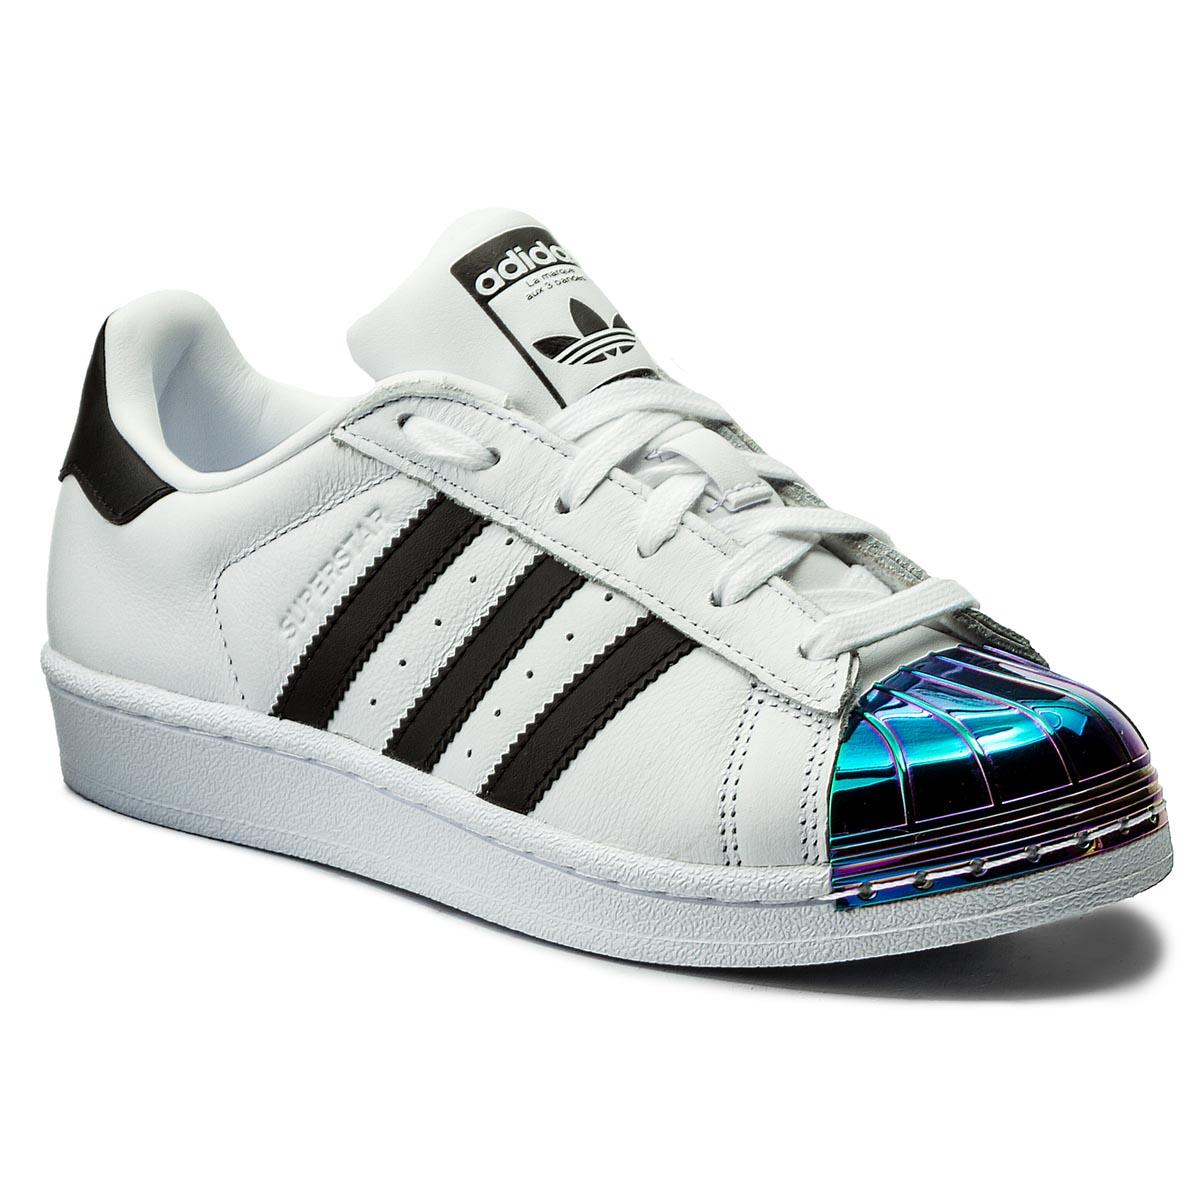 scarpe adidas superstar cm8082 ftwwht / conavy / ftwwht scarpe